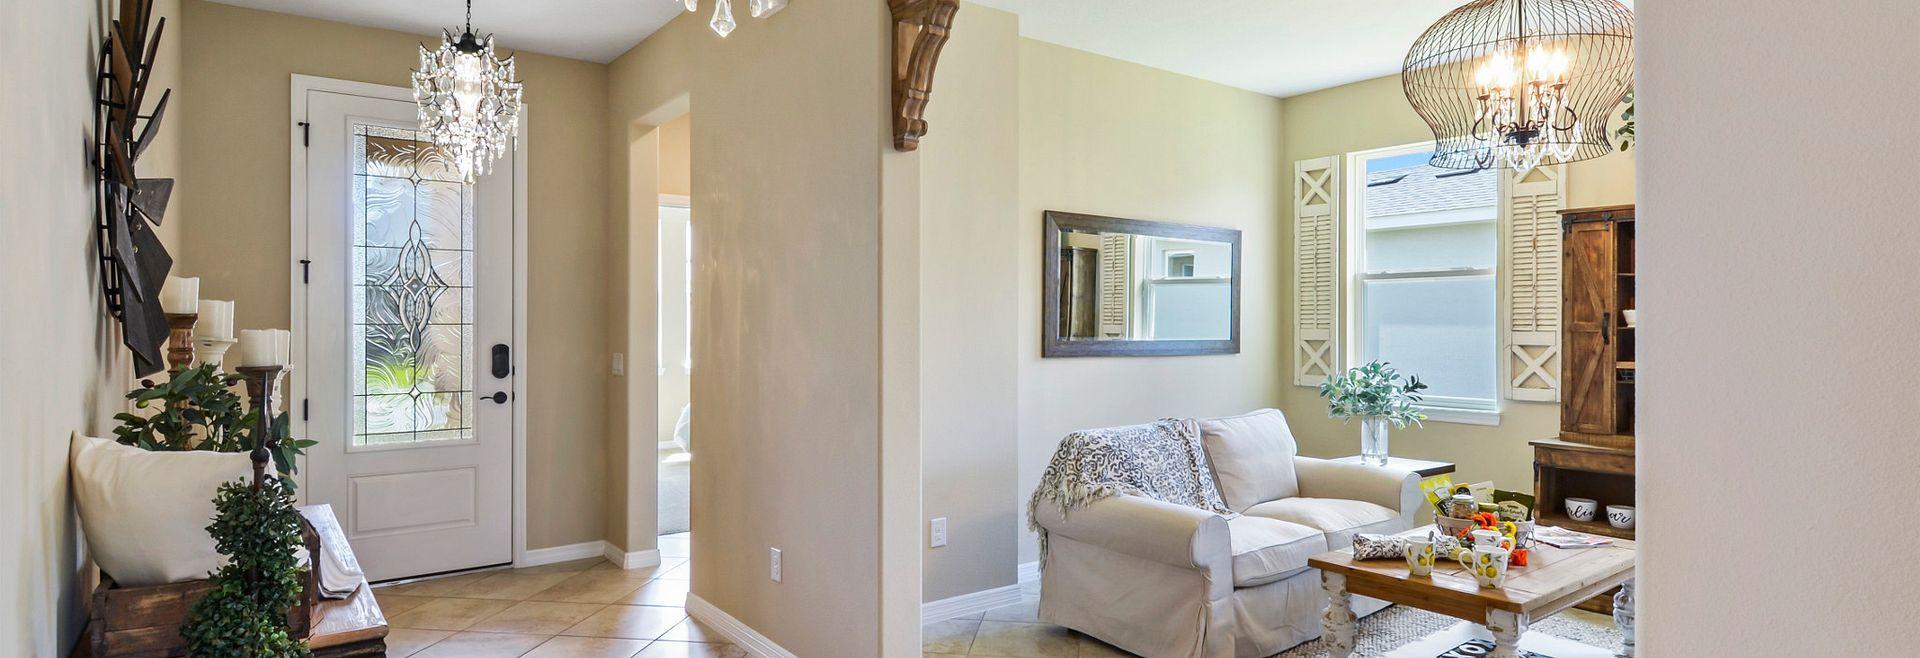 Trilogy at Ocala Preserve Declare Foyer